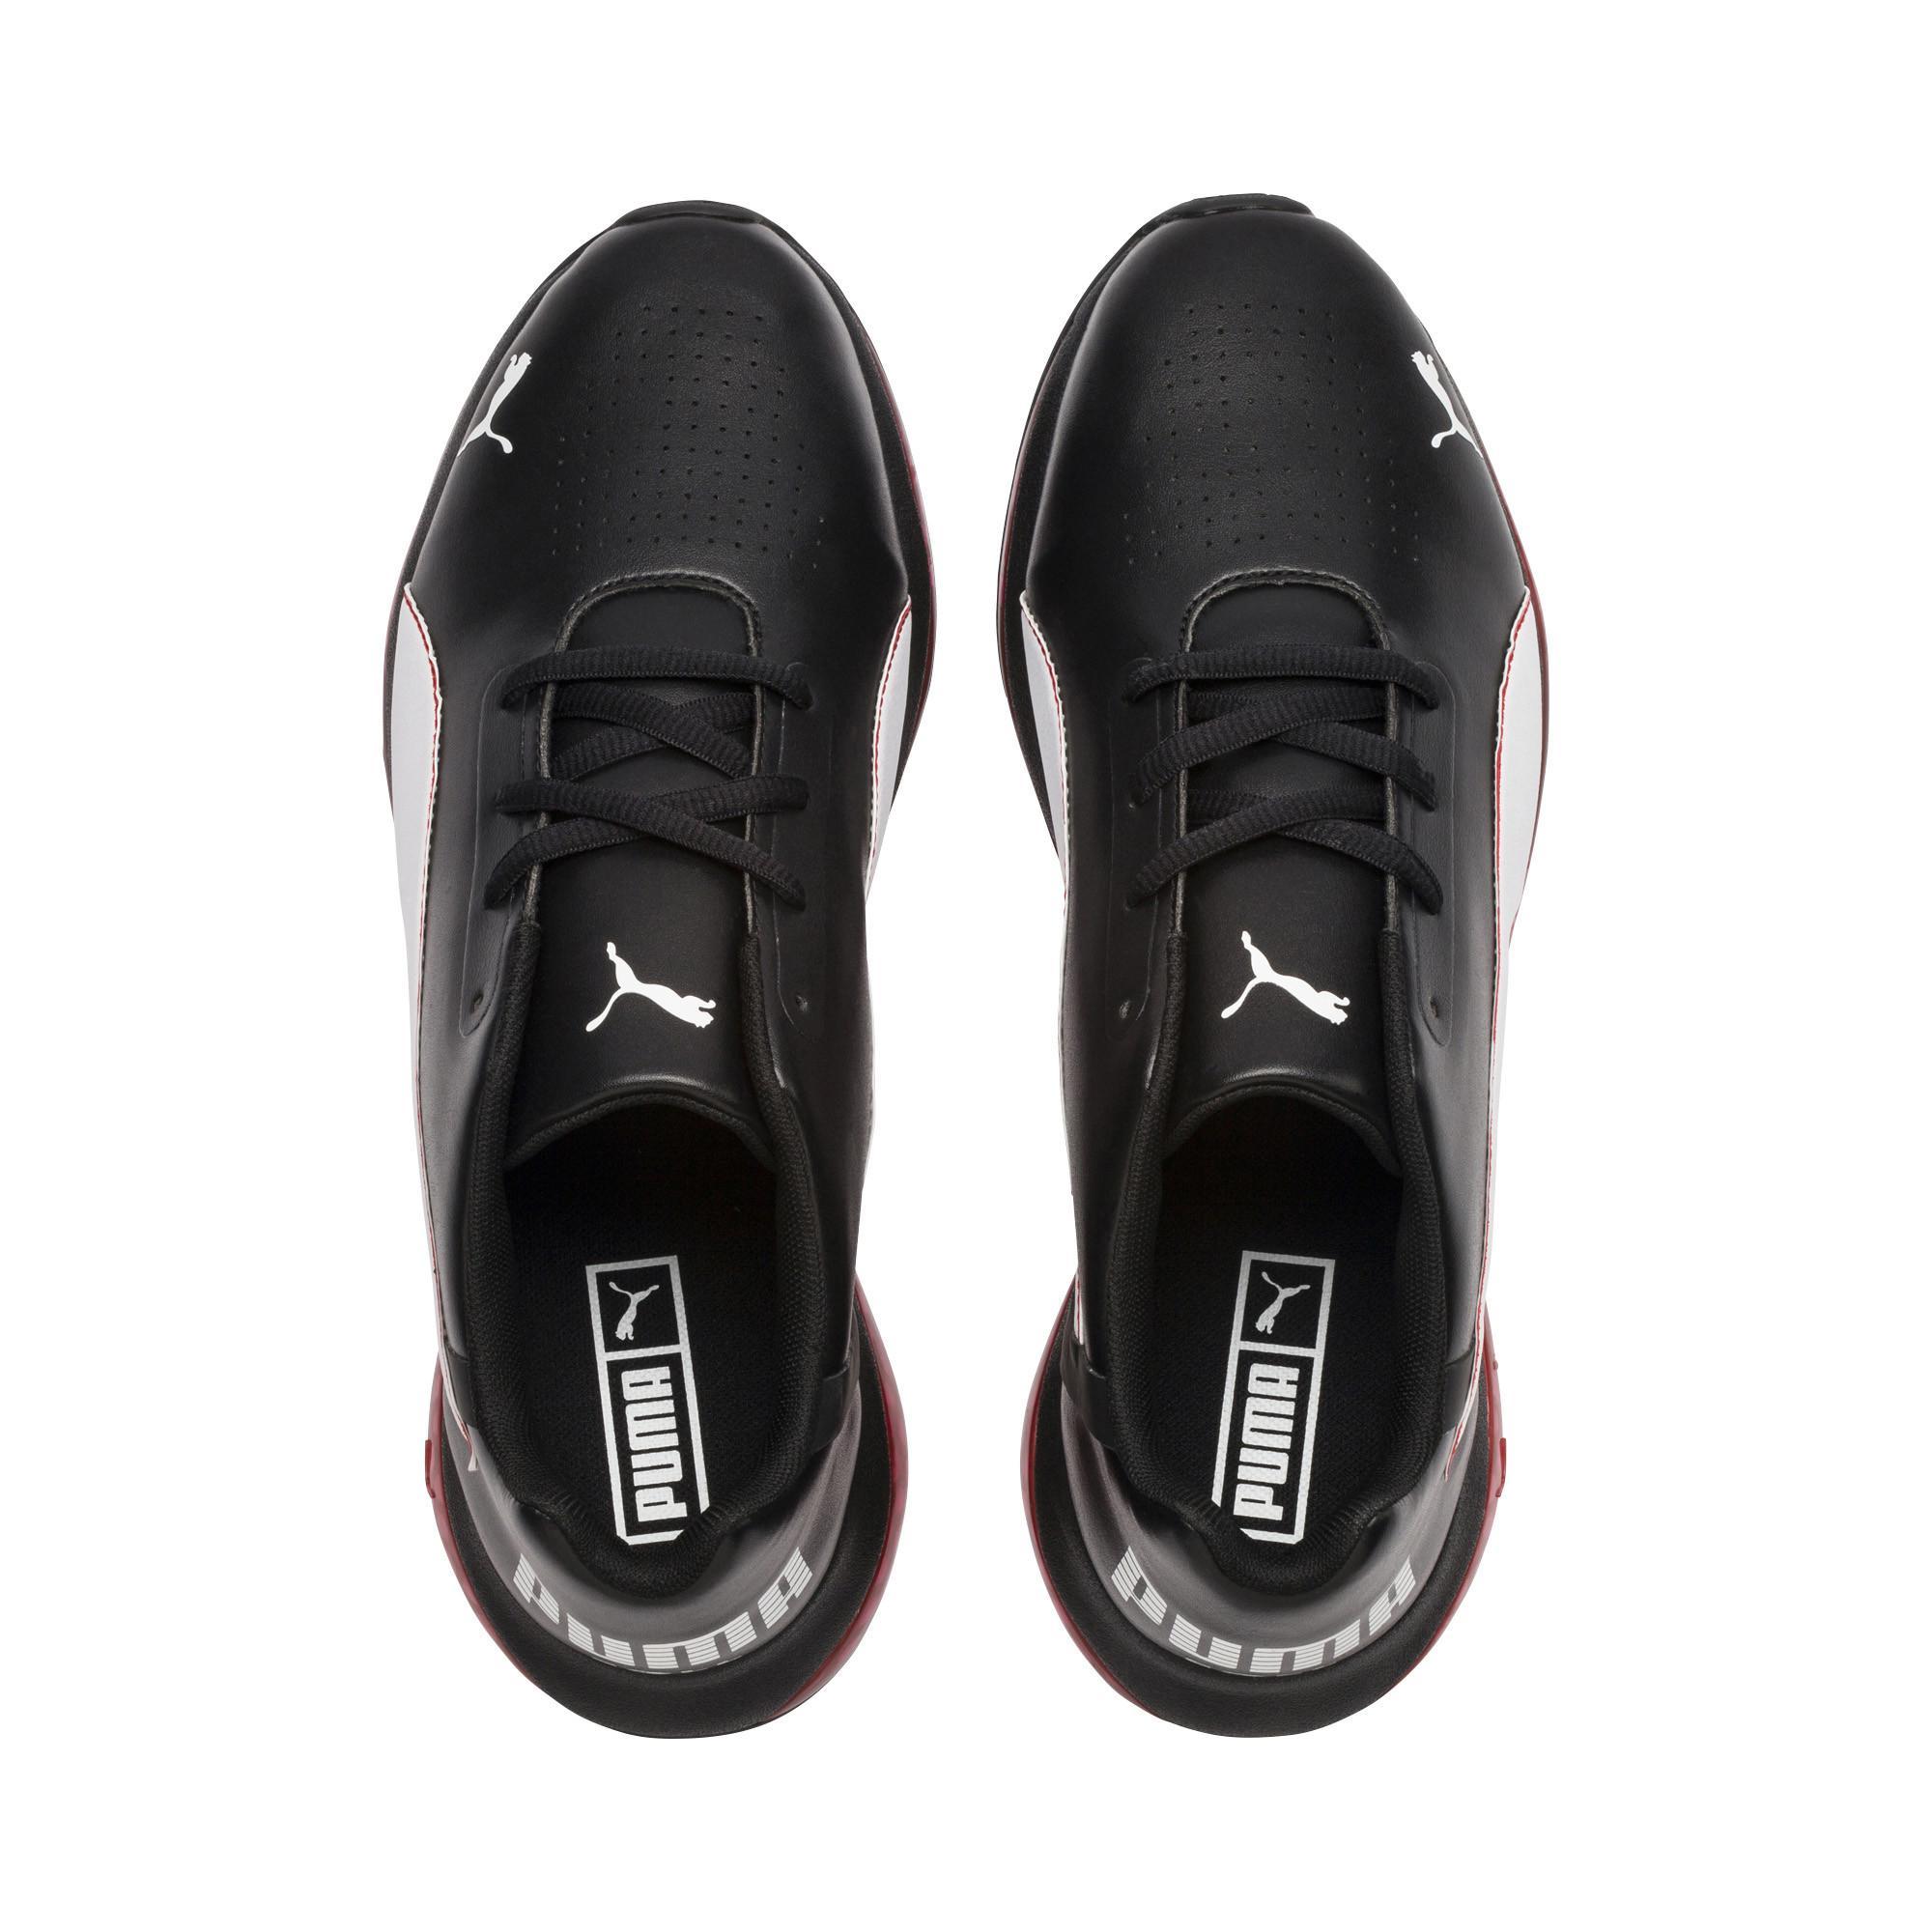 PUMA - Black Cell Ultimate Sl Men s Running Shoes for Men - Lyst. View  fullscreen dc66cb670